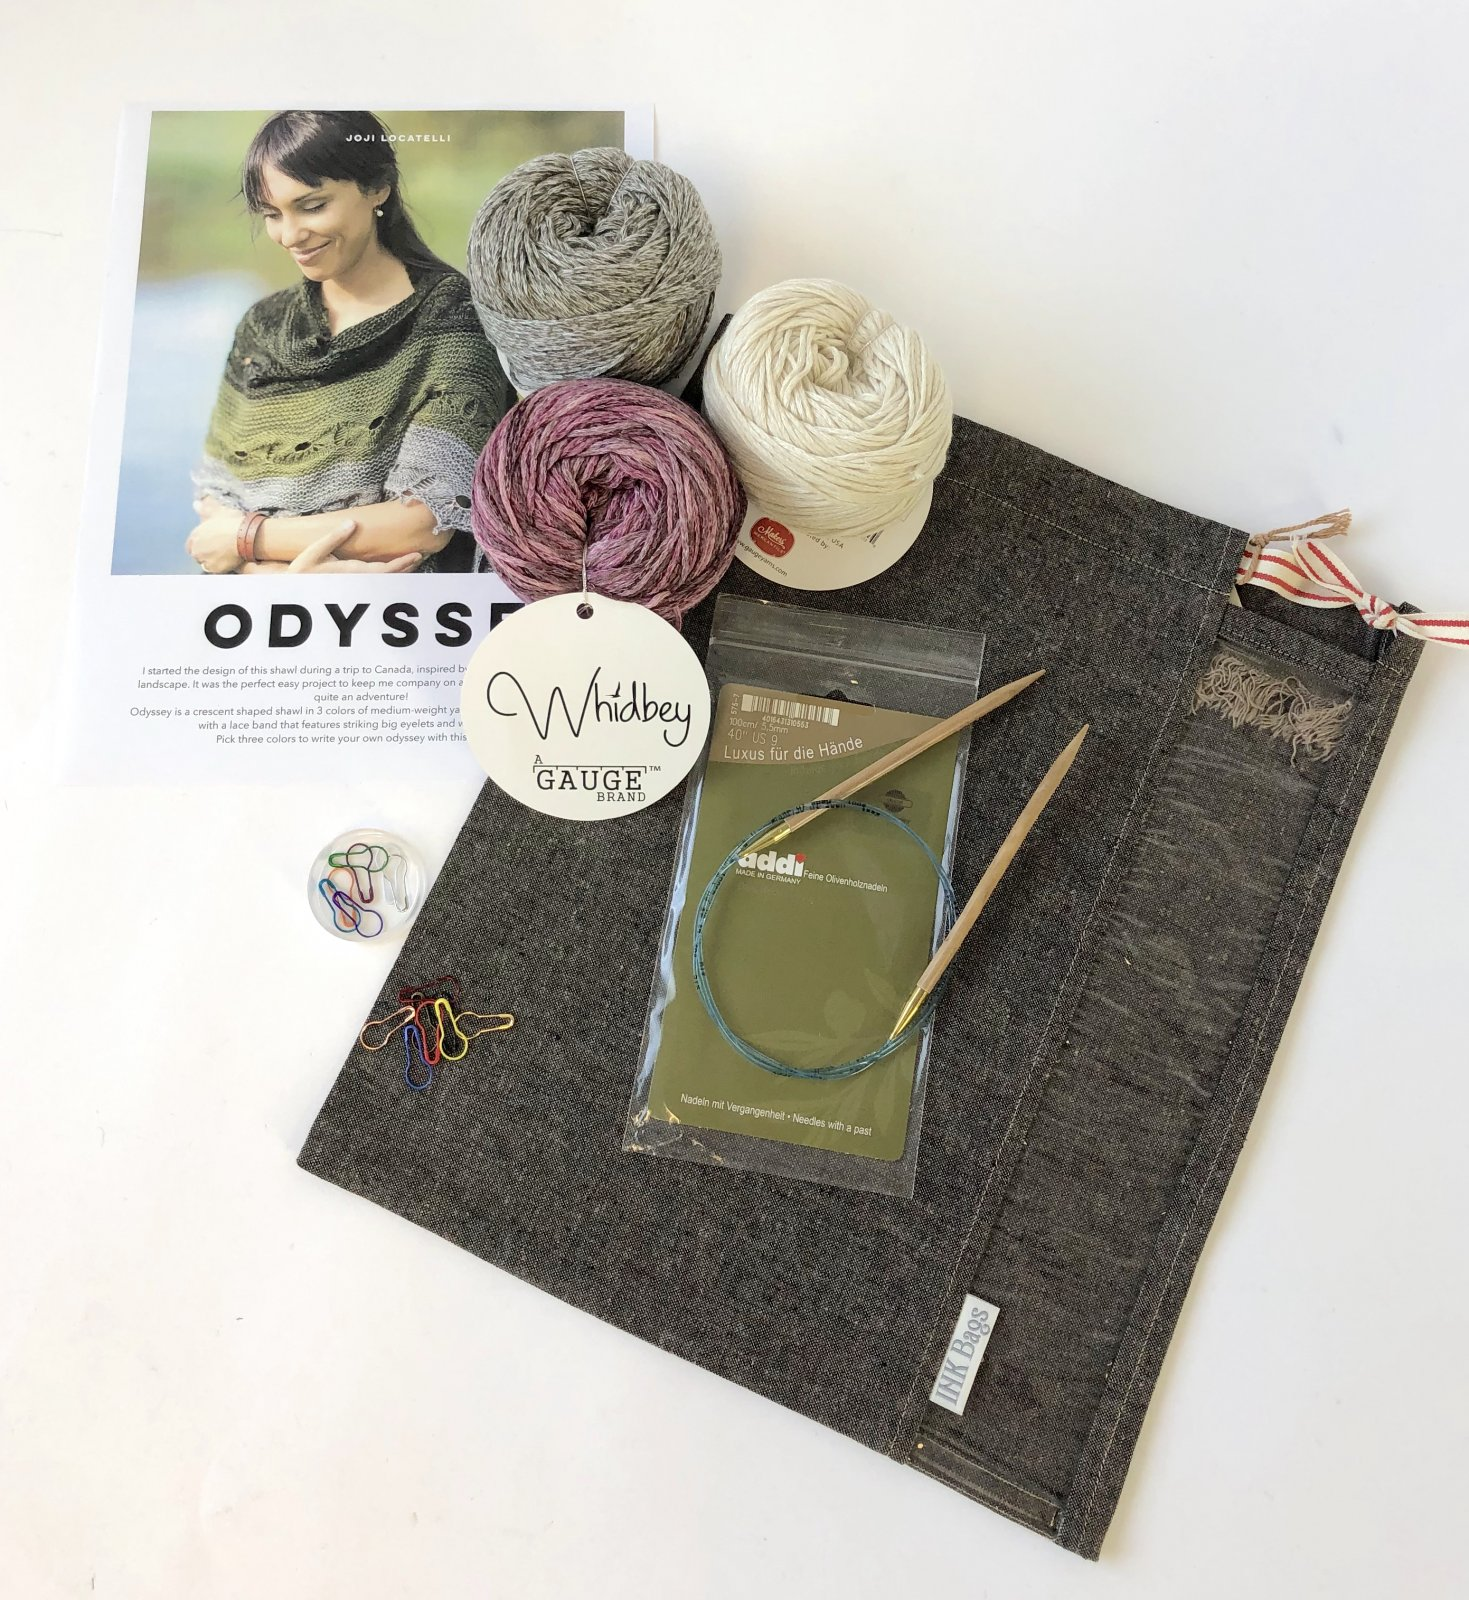 Odyssey Shawl Kit